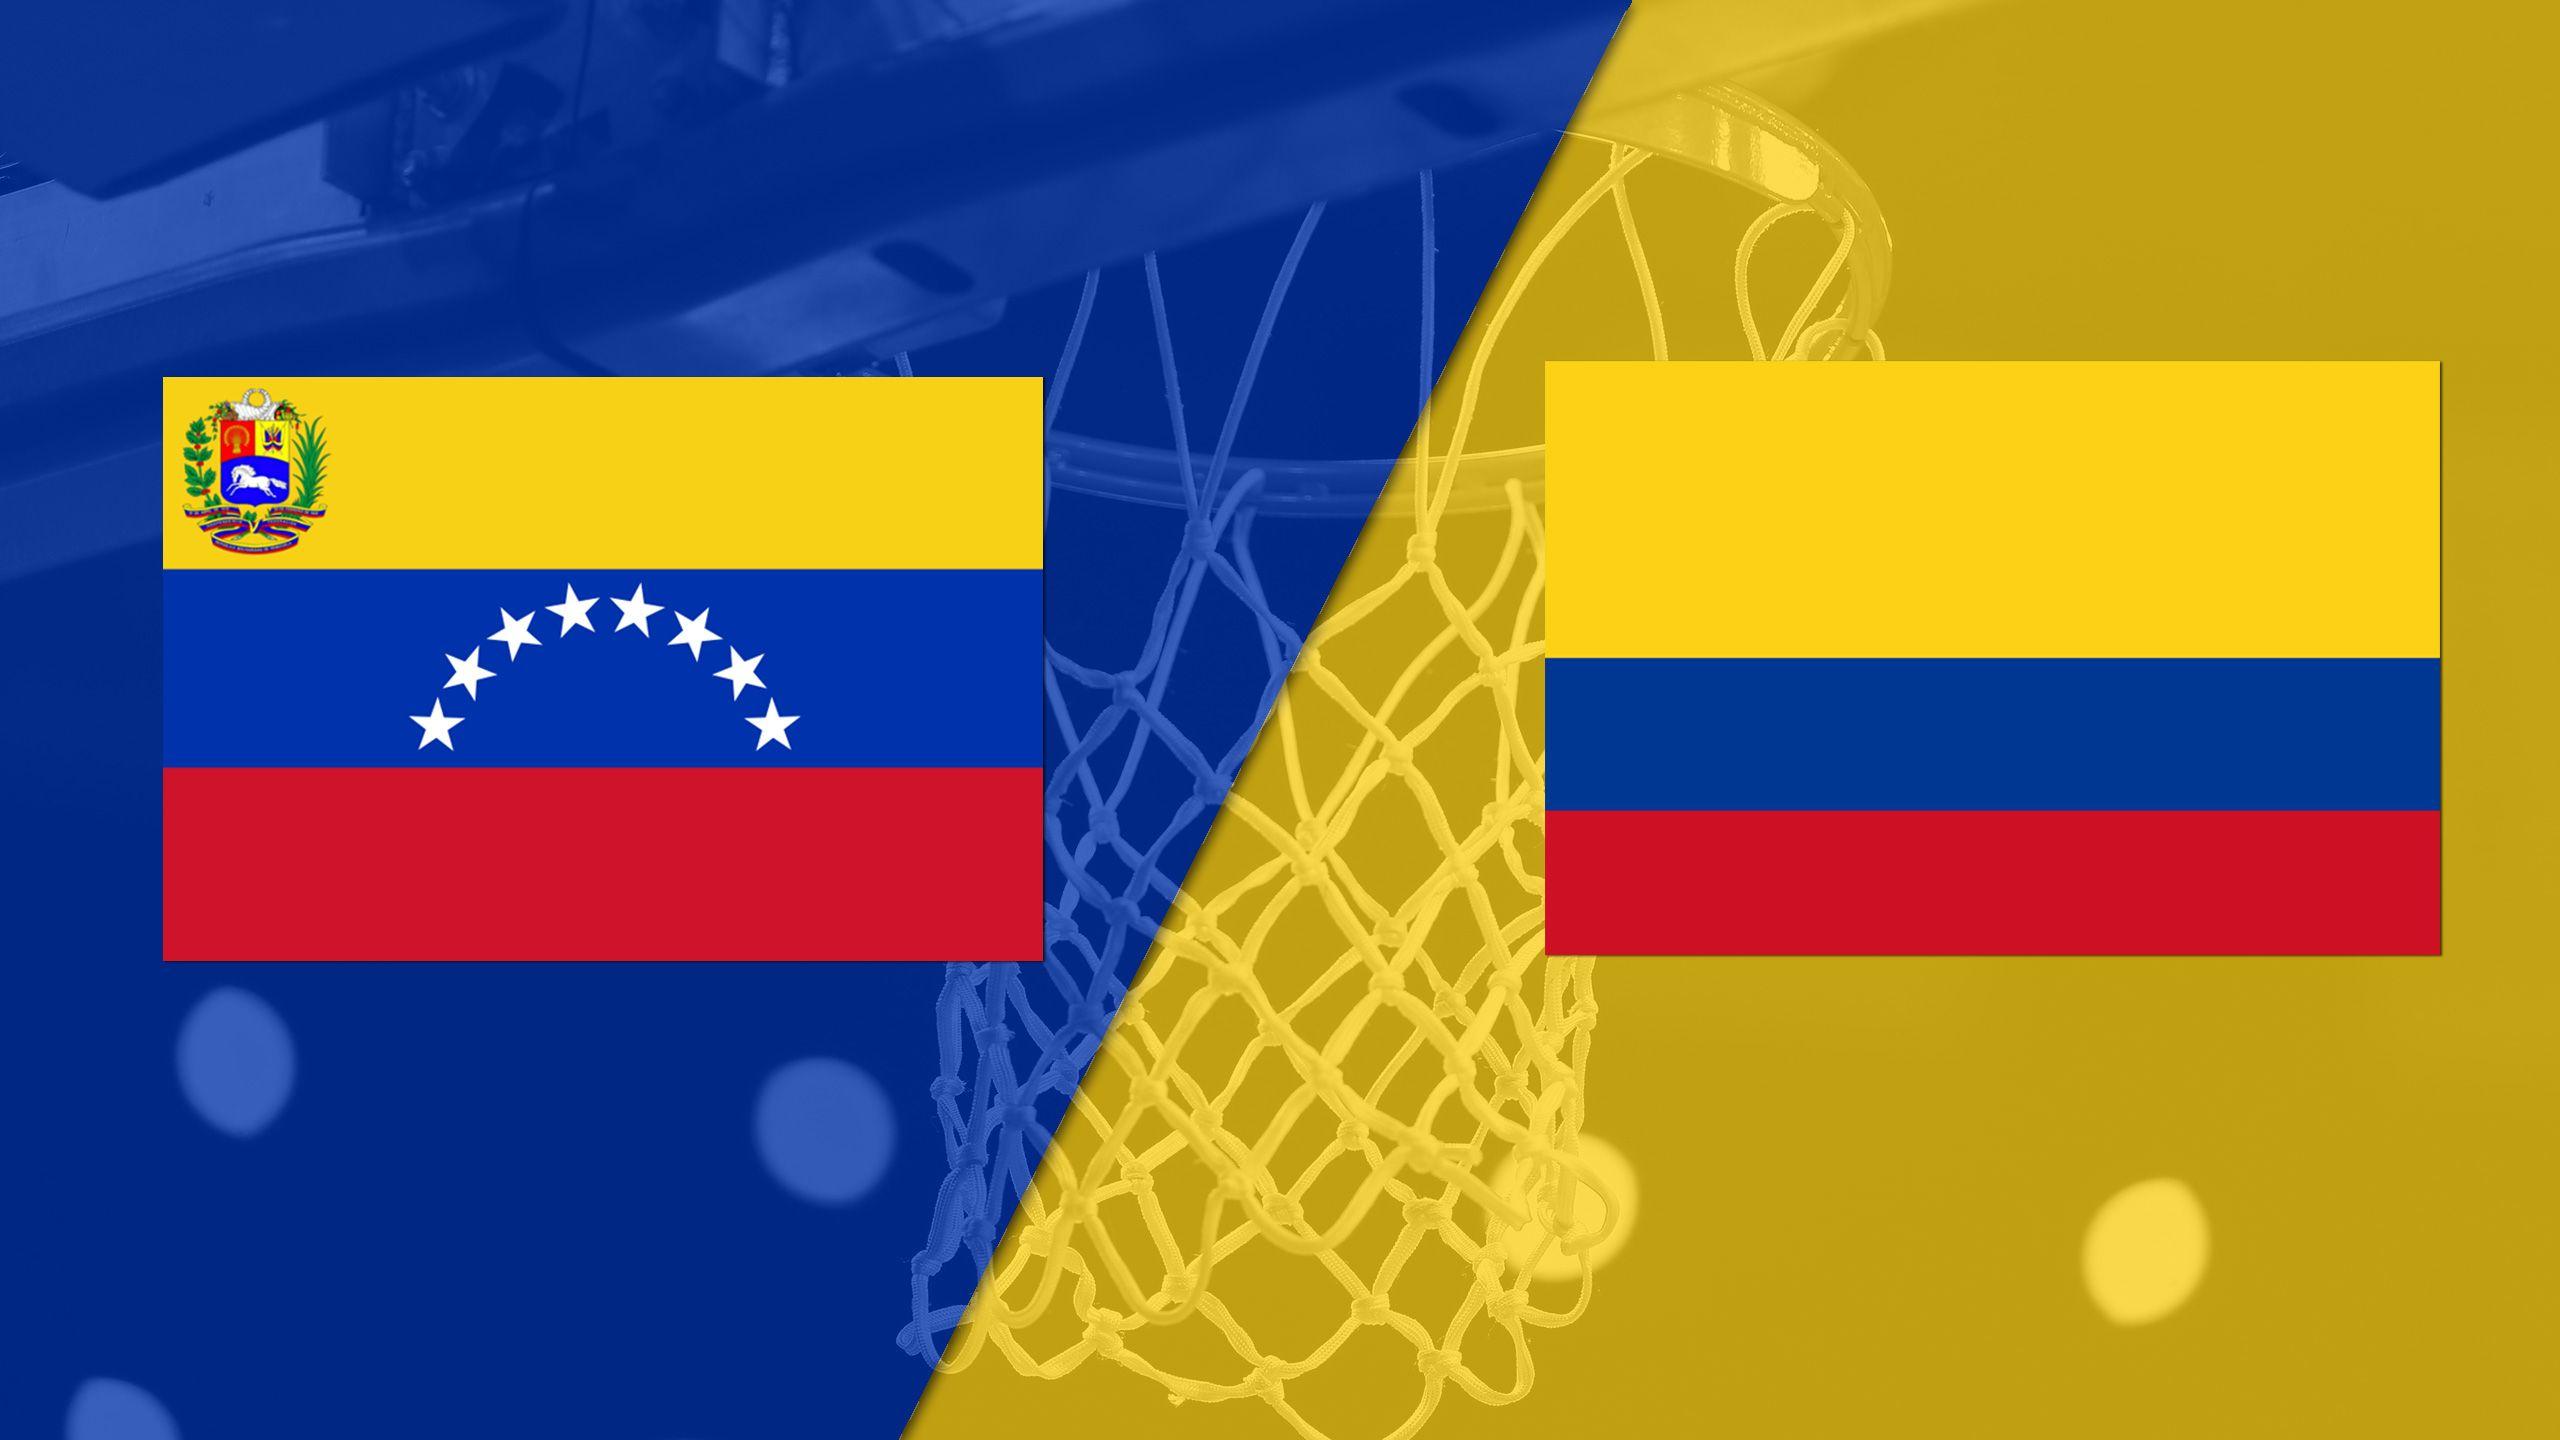 Venezuela vs. Colombia (FIBA World Cup 2019 Qualifier)